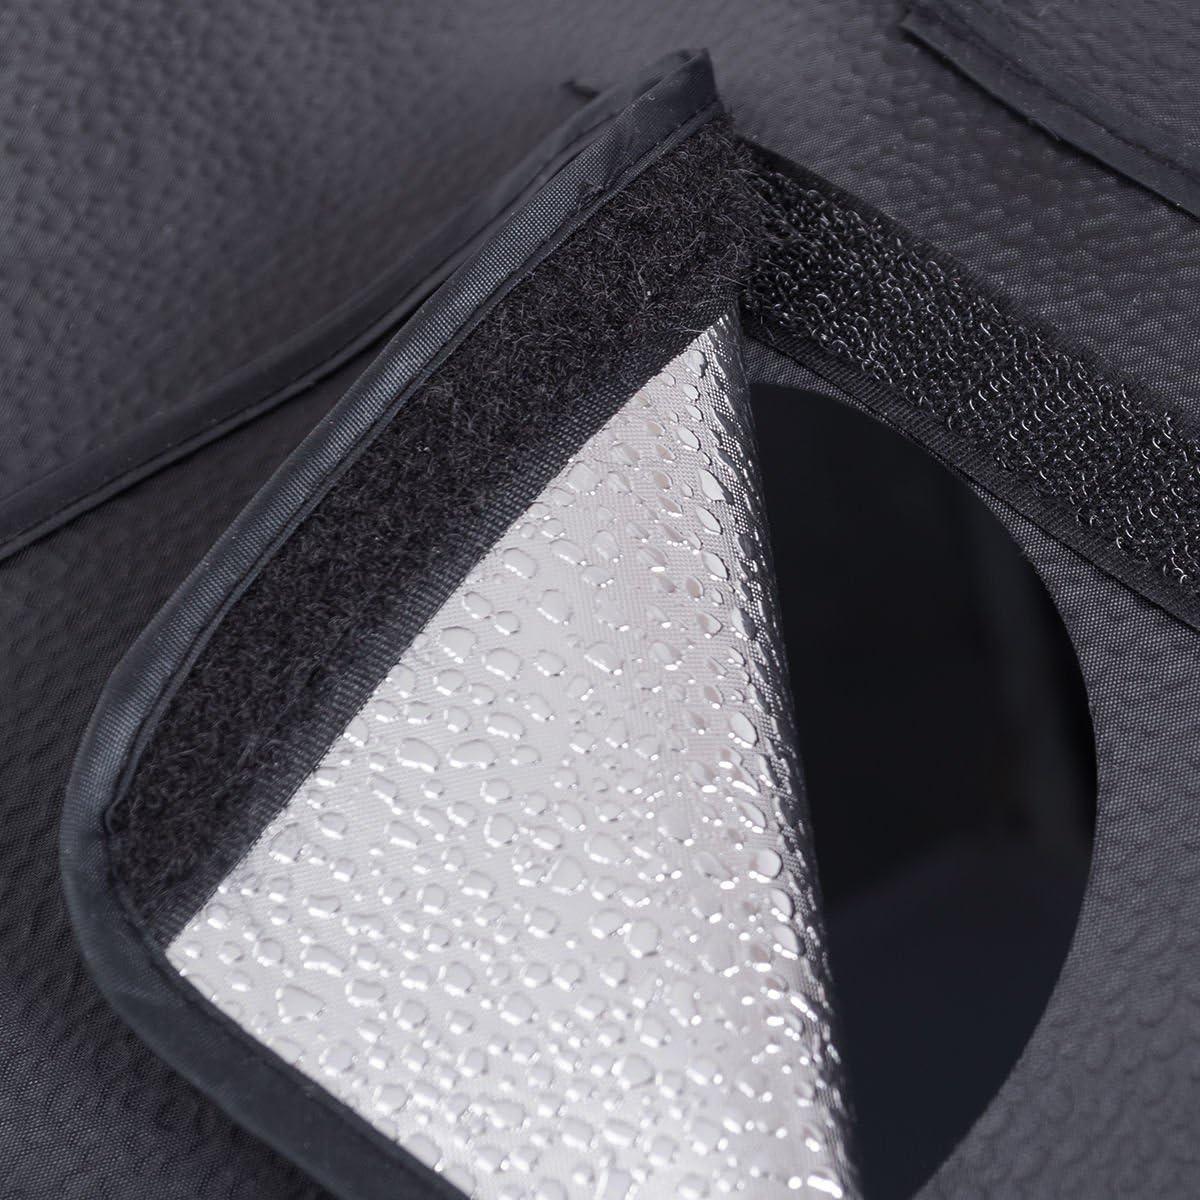 Safstar Portable 16 x 16 x 16 Photo LED Studio Shooting Tent Photography Box Cube Lighting Kit with 3 Colors Backdrops Black, White, Yellow